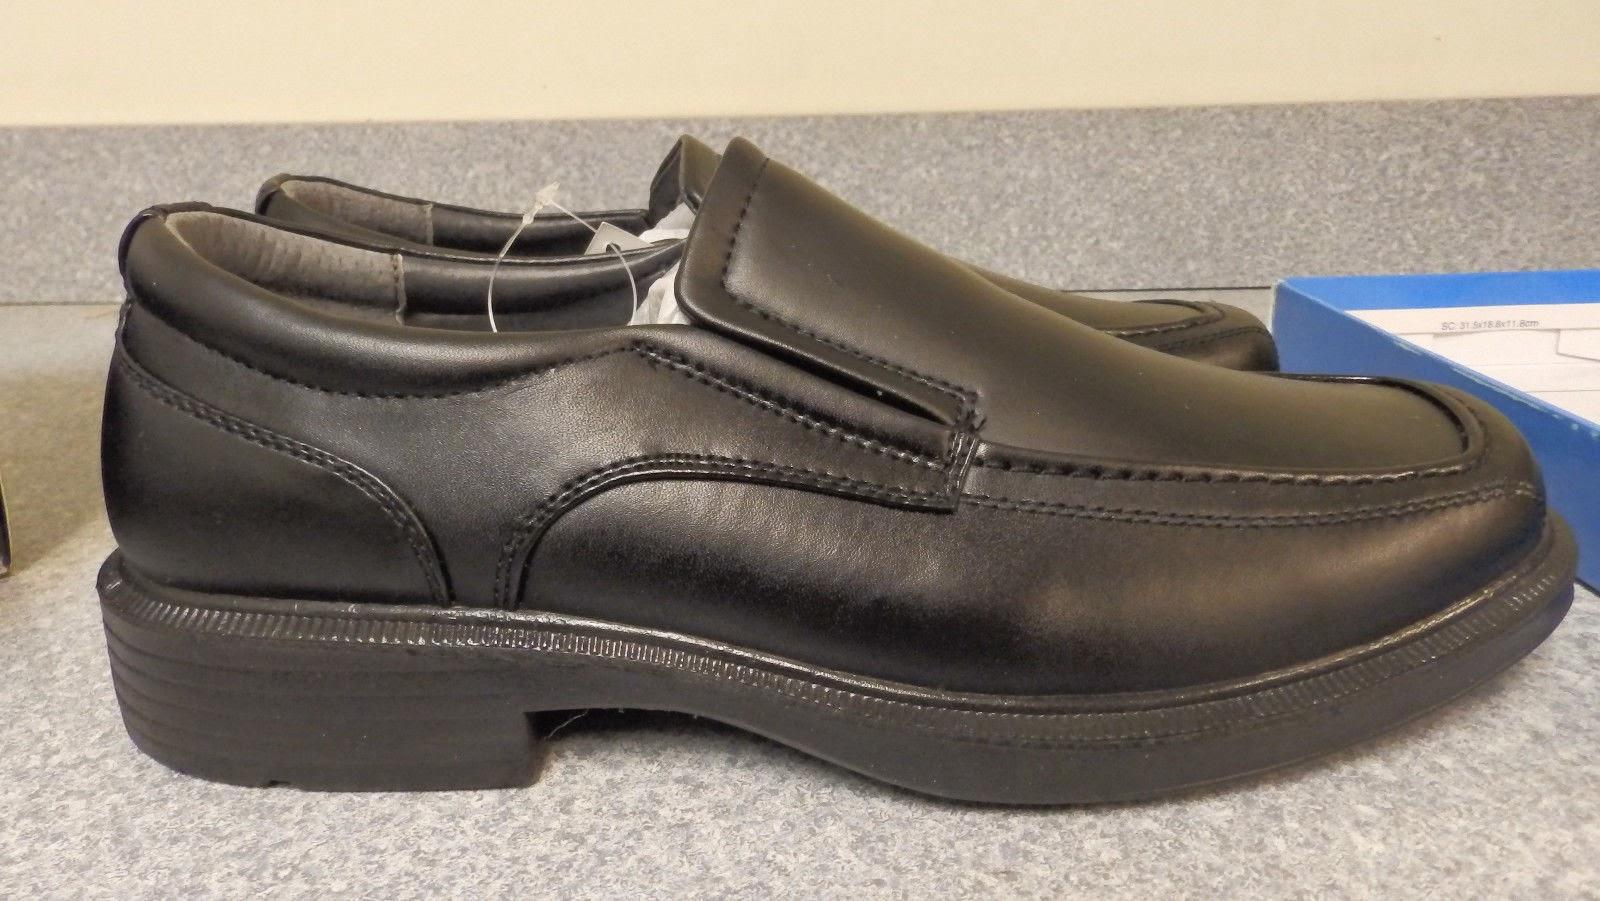 http://www.ebay.com/itm/Soft-Stags-Mens-shoes-Mason-Black-size-10M-Vegan-/321689700351?pt=LH_DefaultDomain_0&hash=item4ae63347ff